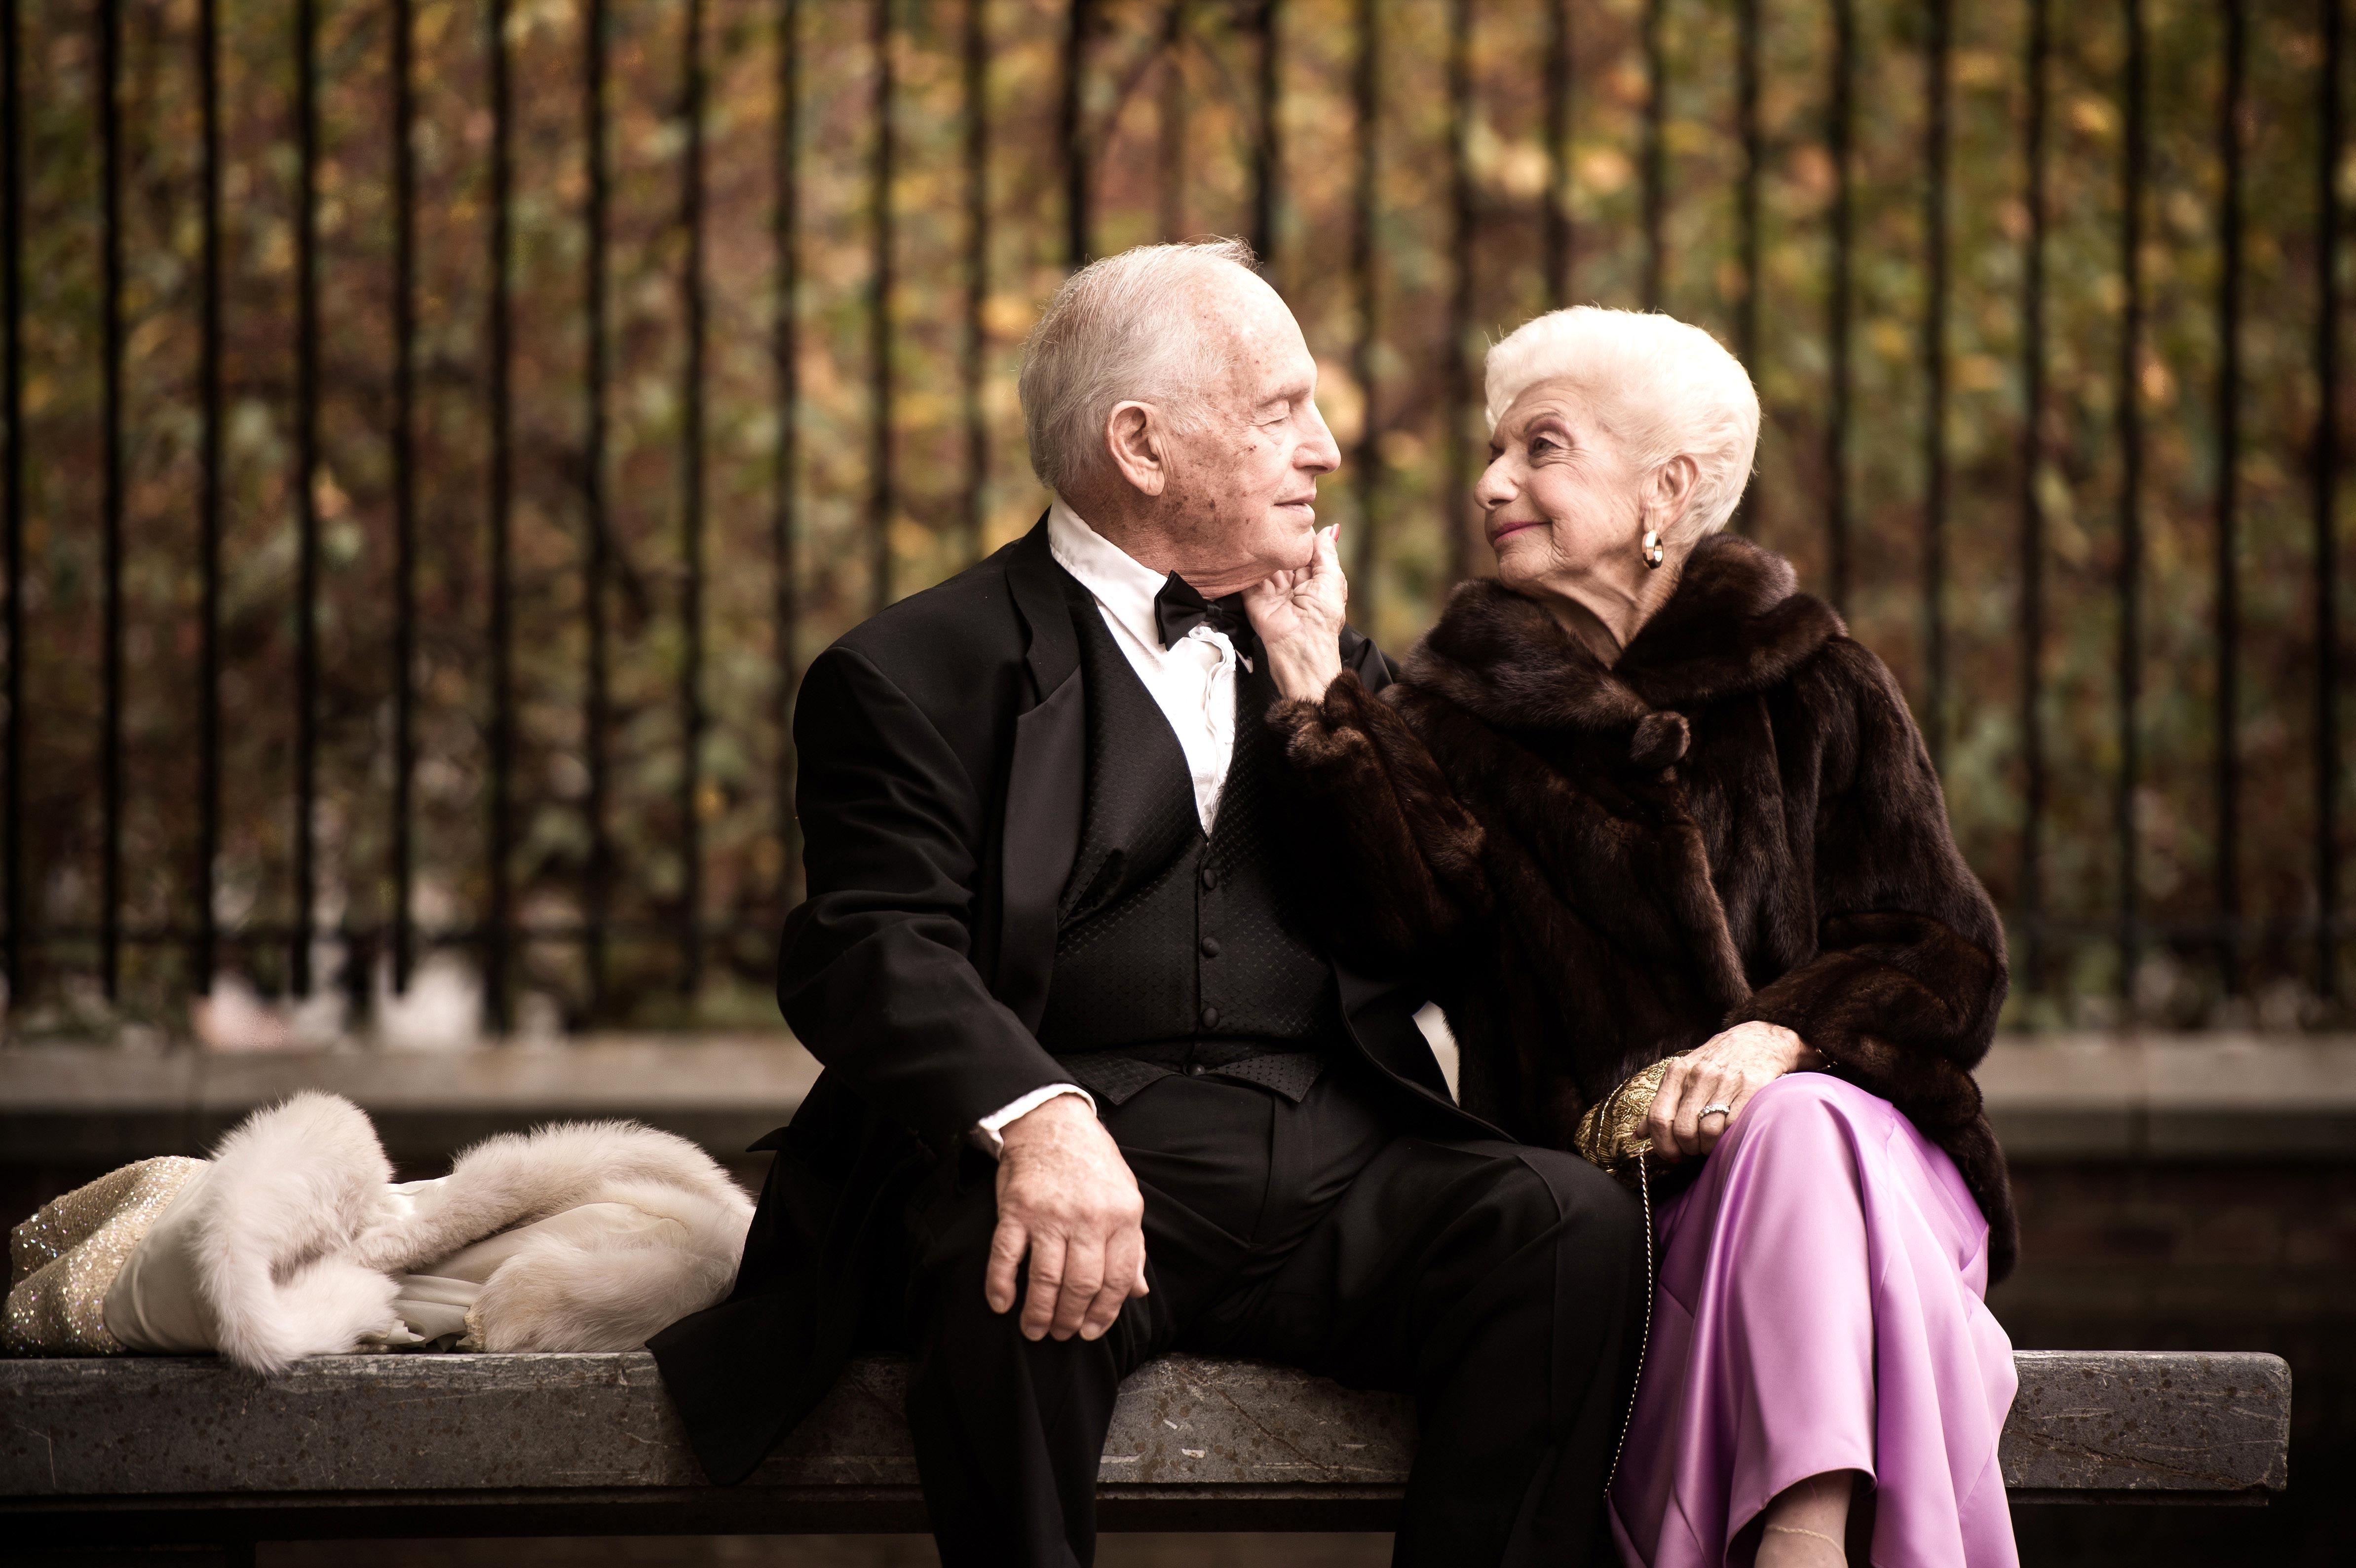 anniversary photo couple bench